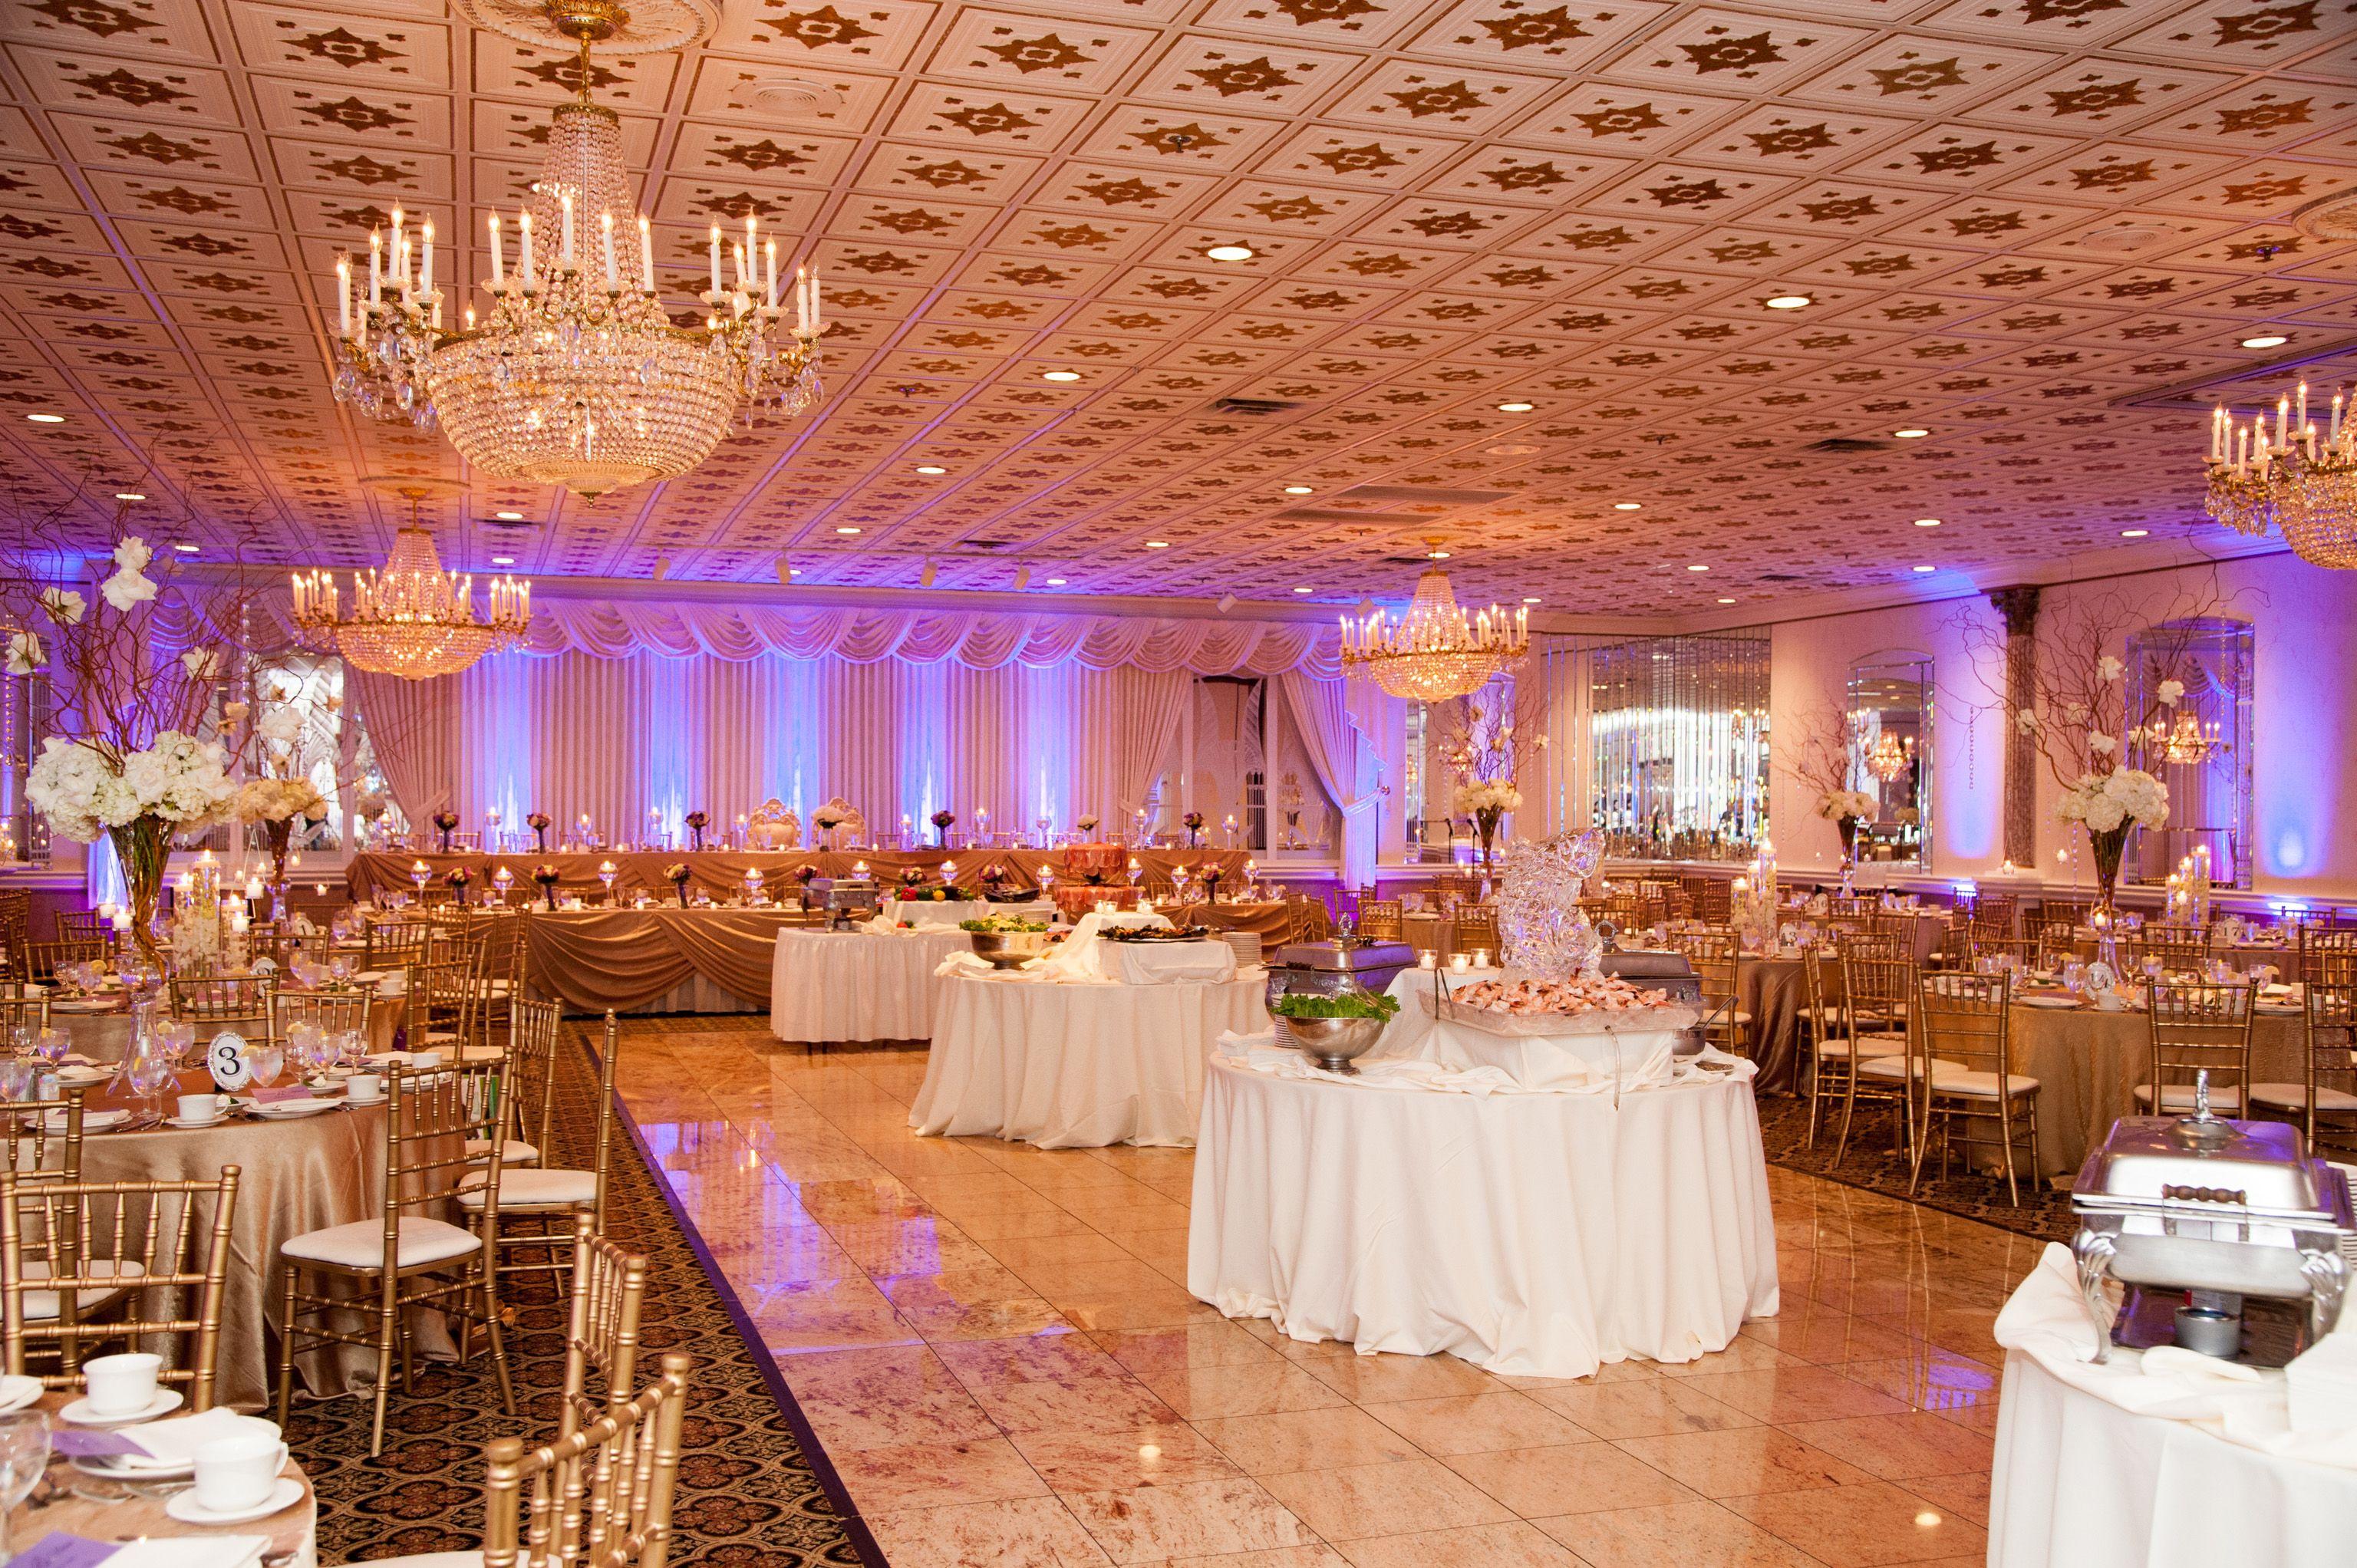 Des Plaines Il Chicago Wedding Venues Wedding Venues Wedding